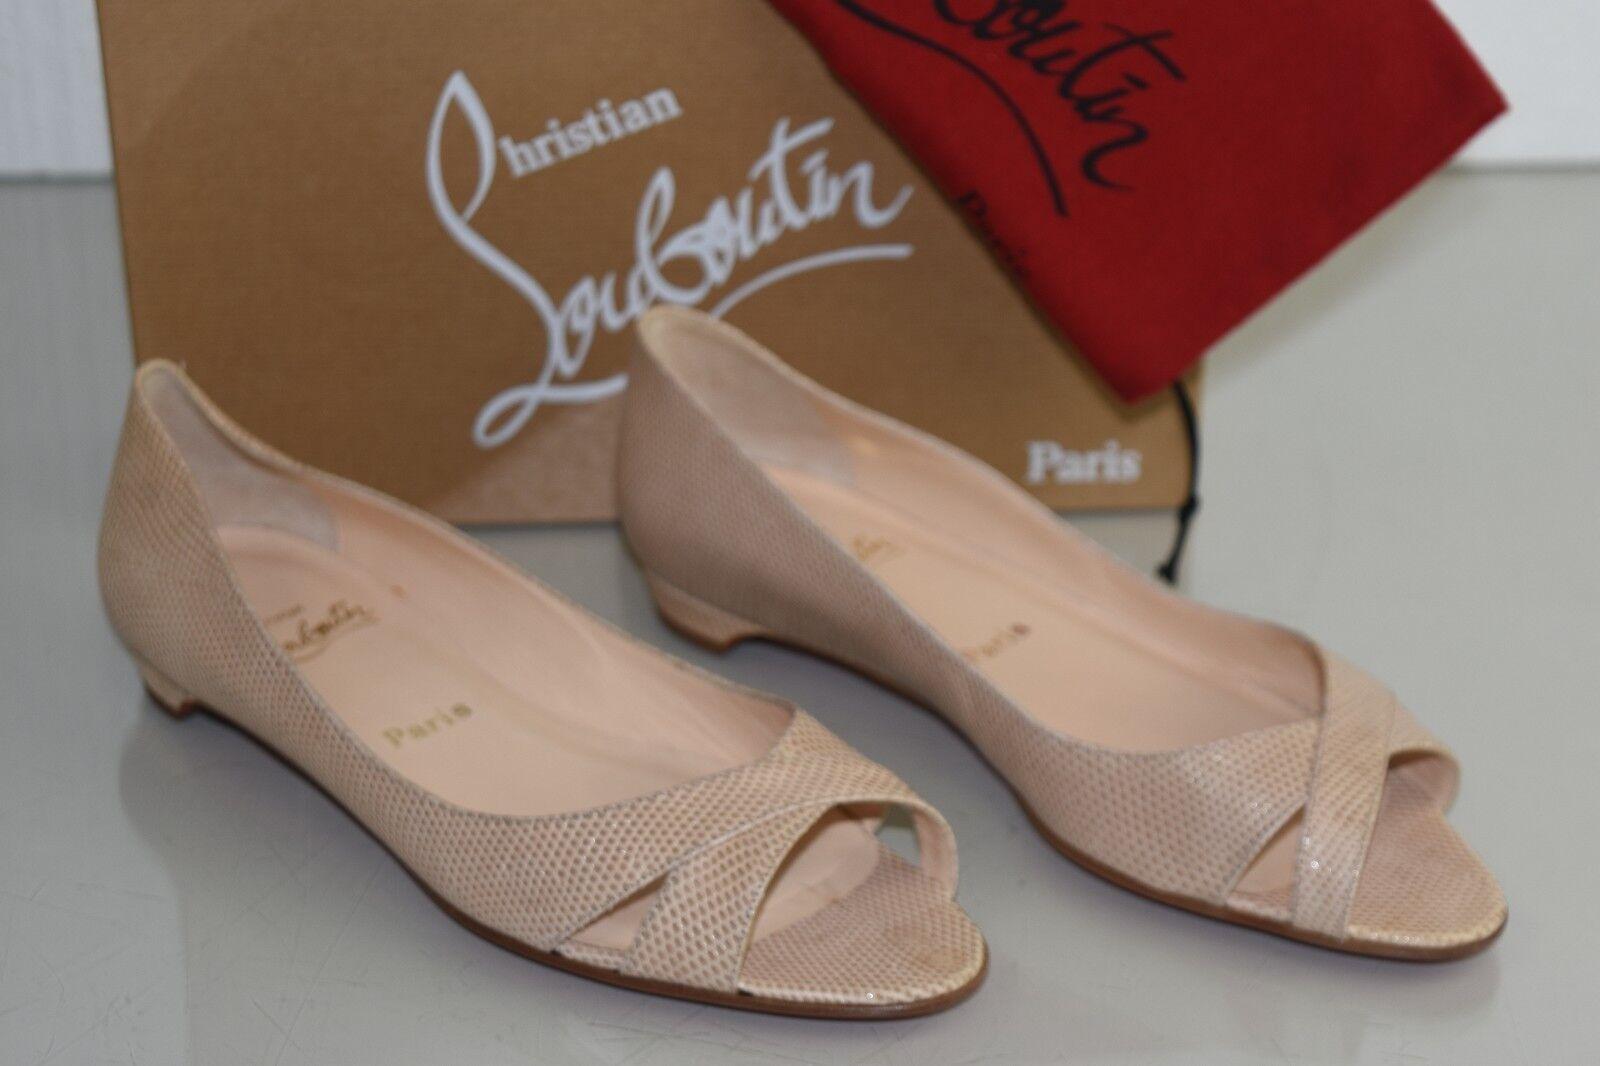 NEW Christian Louboutin UN VOILIER Flats Peep Toe Taupe Beige LIZARD shoes 40